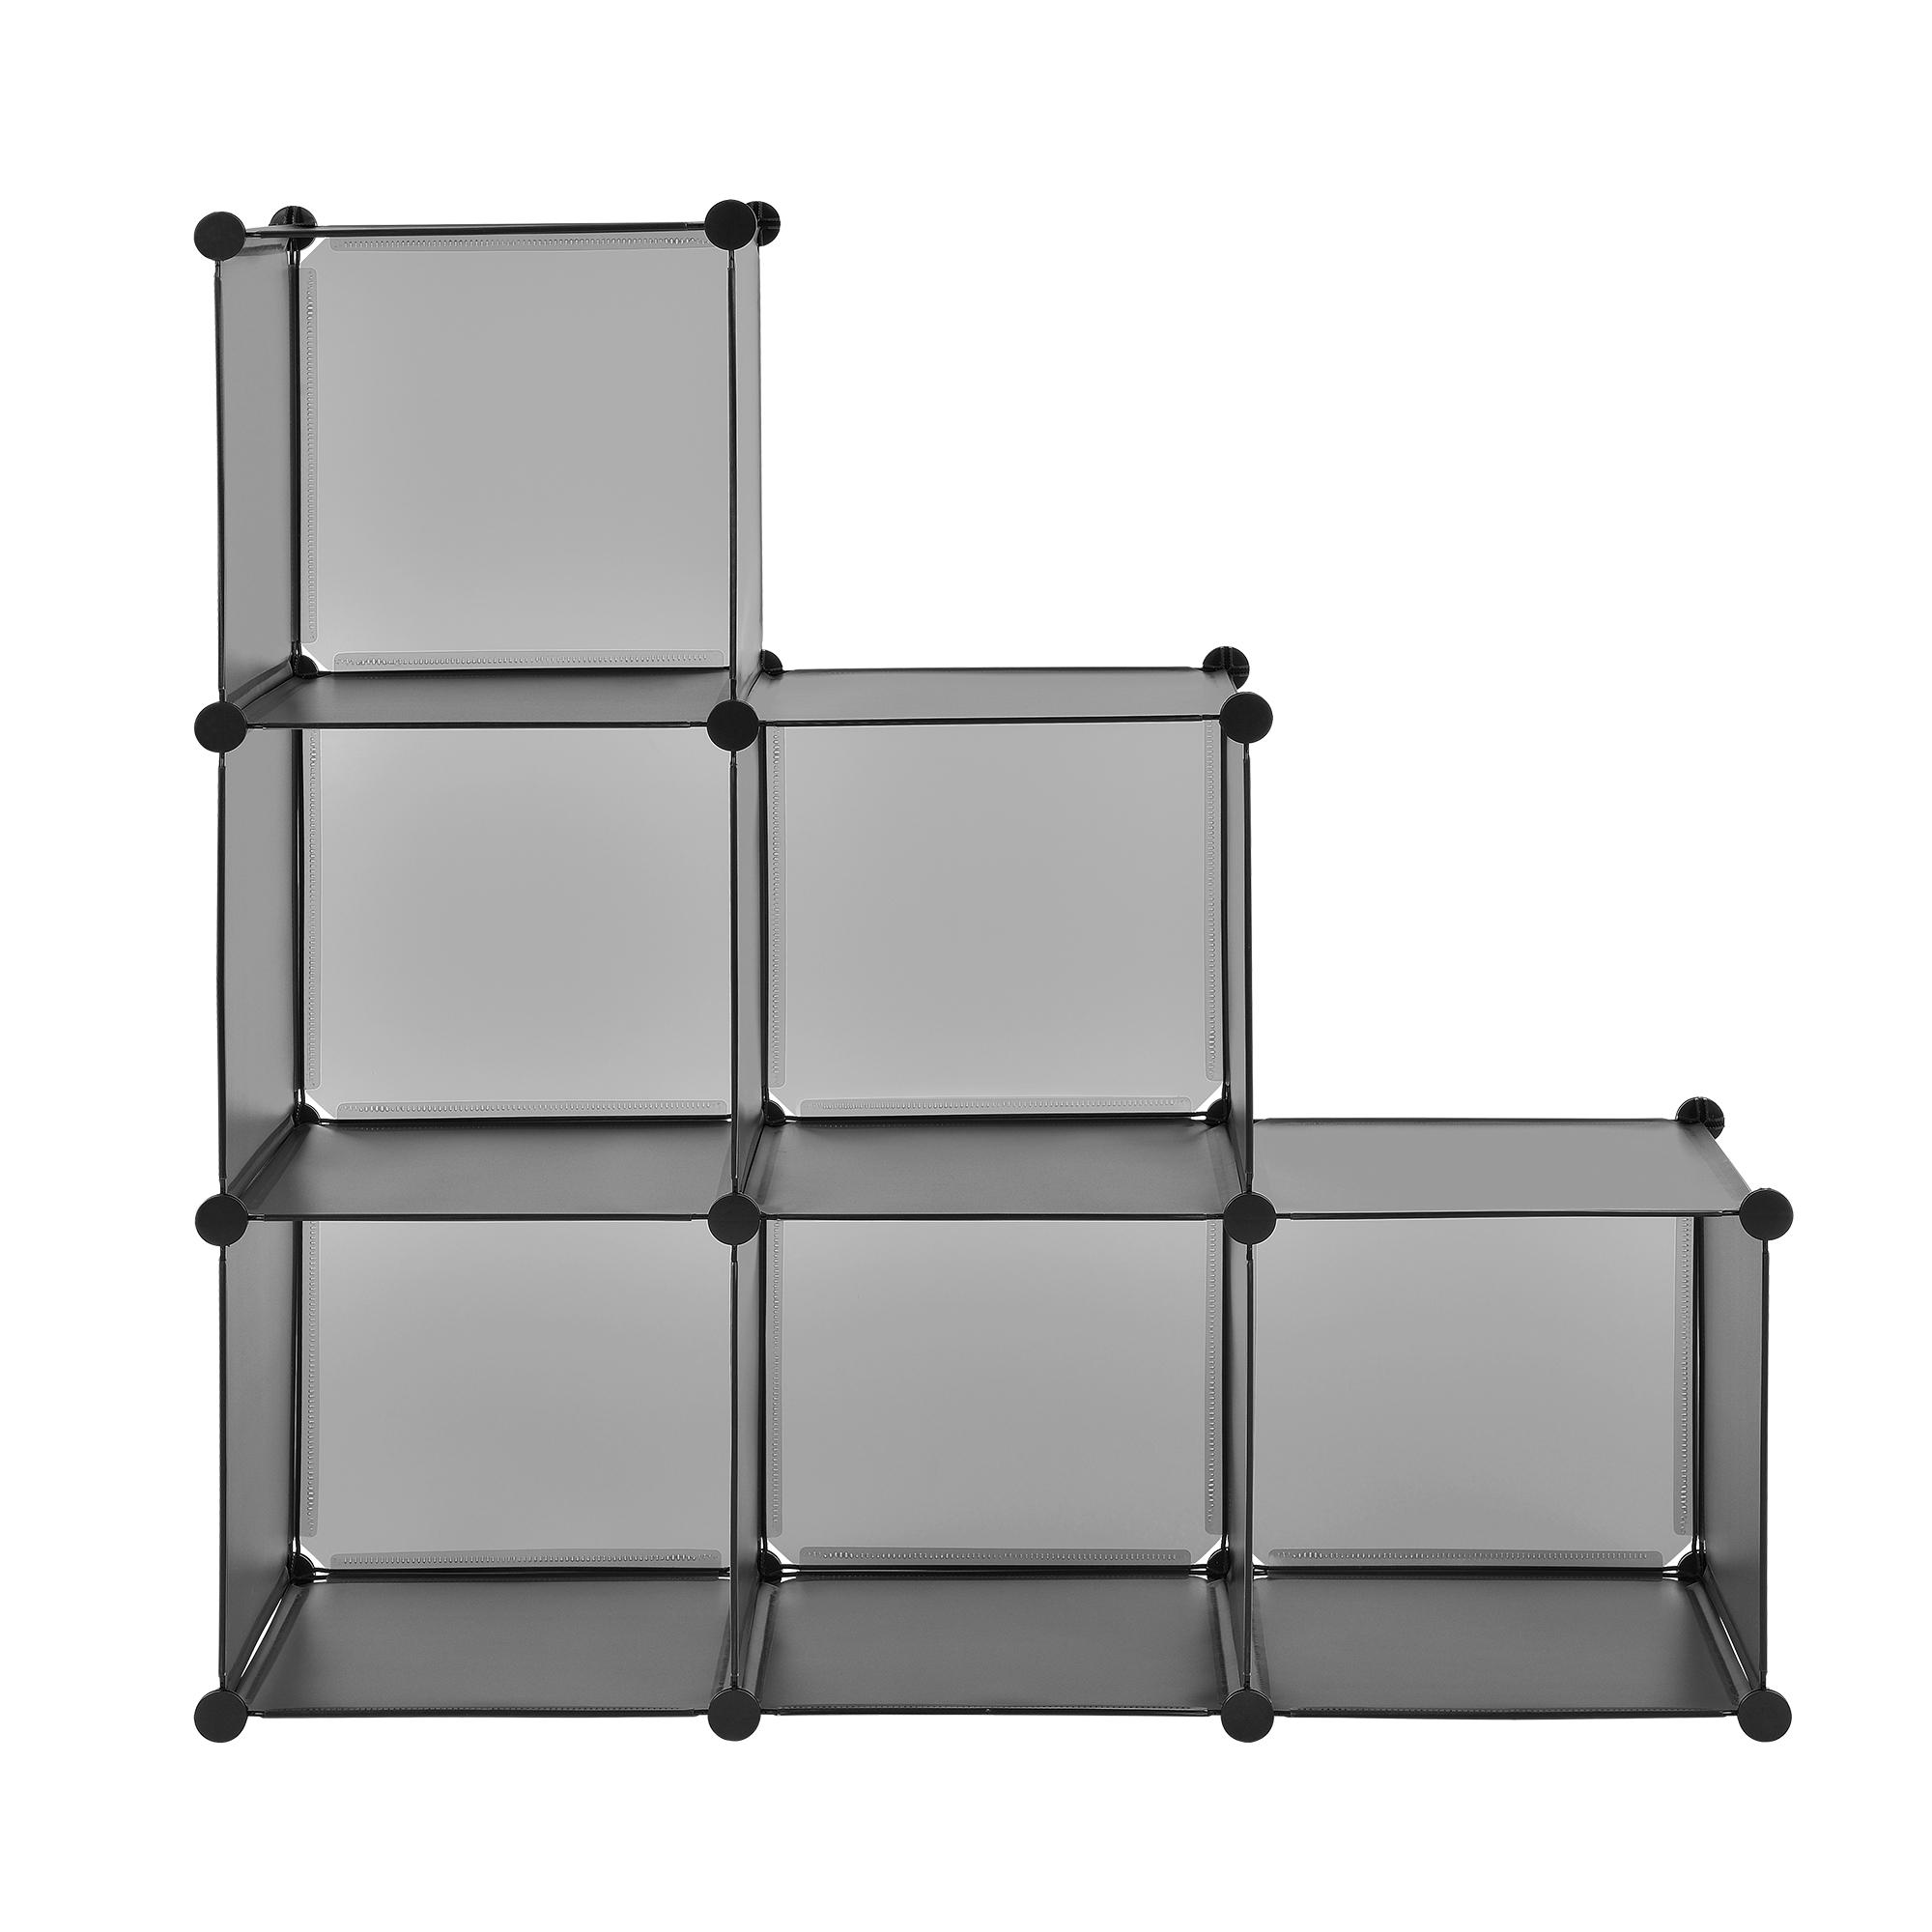 neu haus diy system regal schrank 110x110cm garderobe. Black Bedroom Furniture Sets. Home Design Ideas